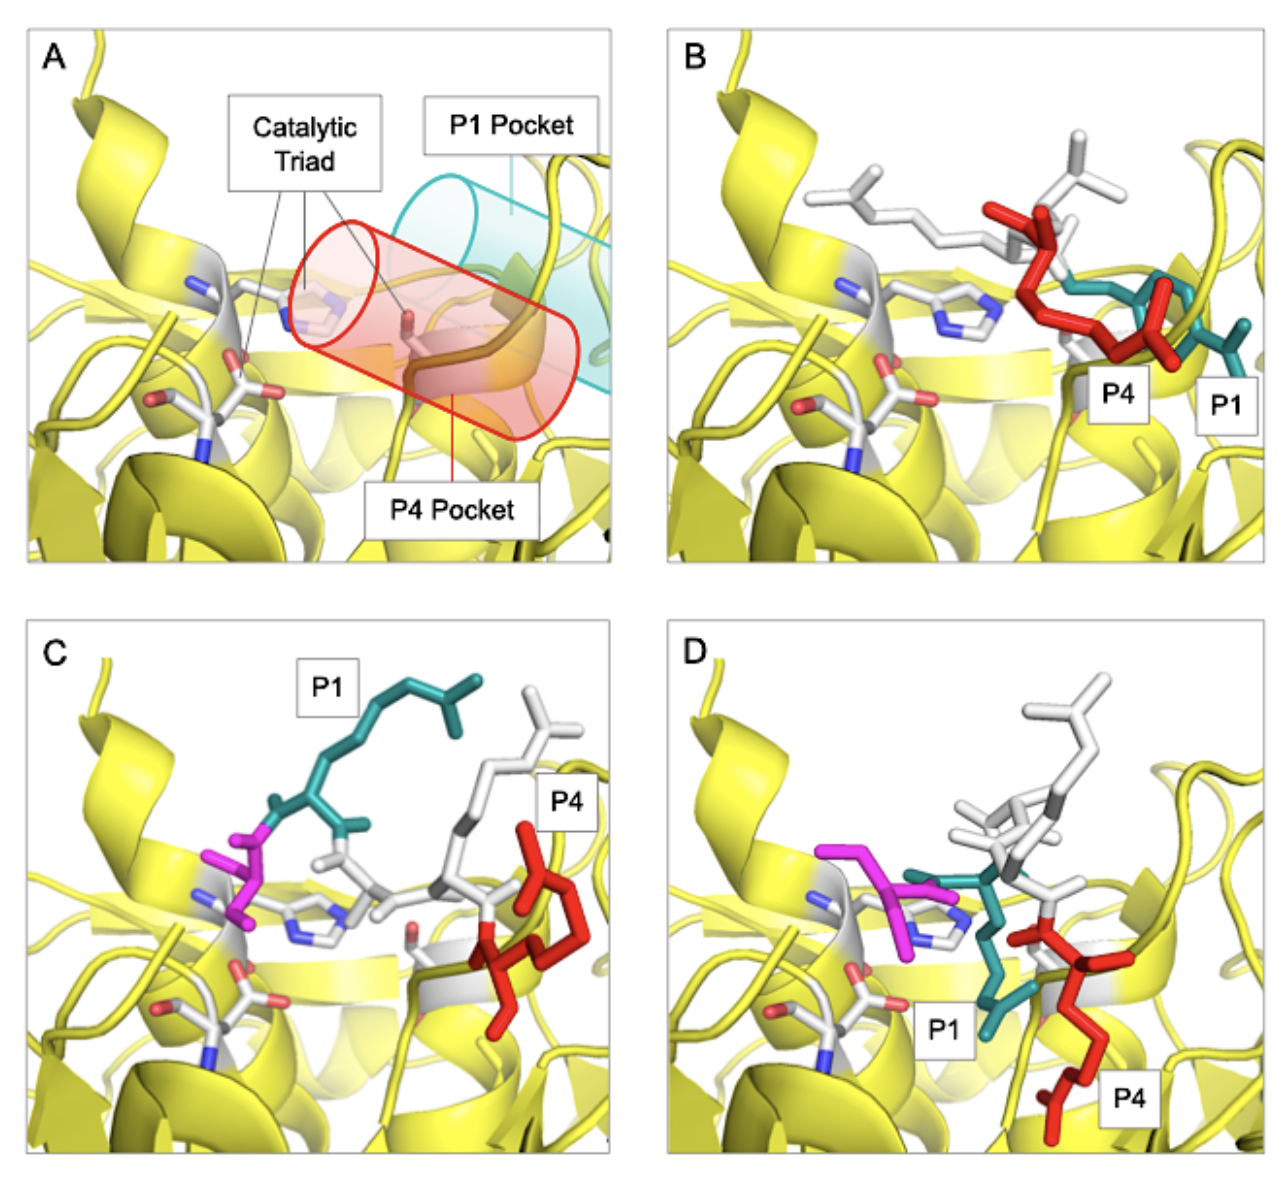 Figure_3-D614-G614-SARS-CoV-2